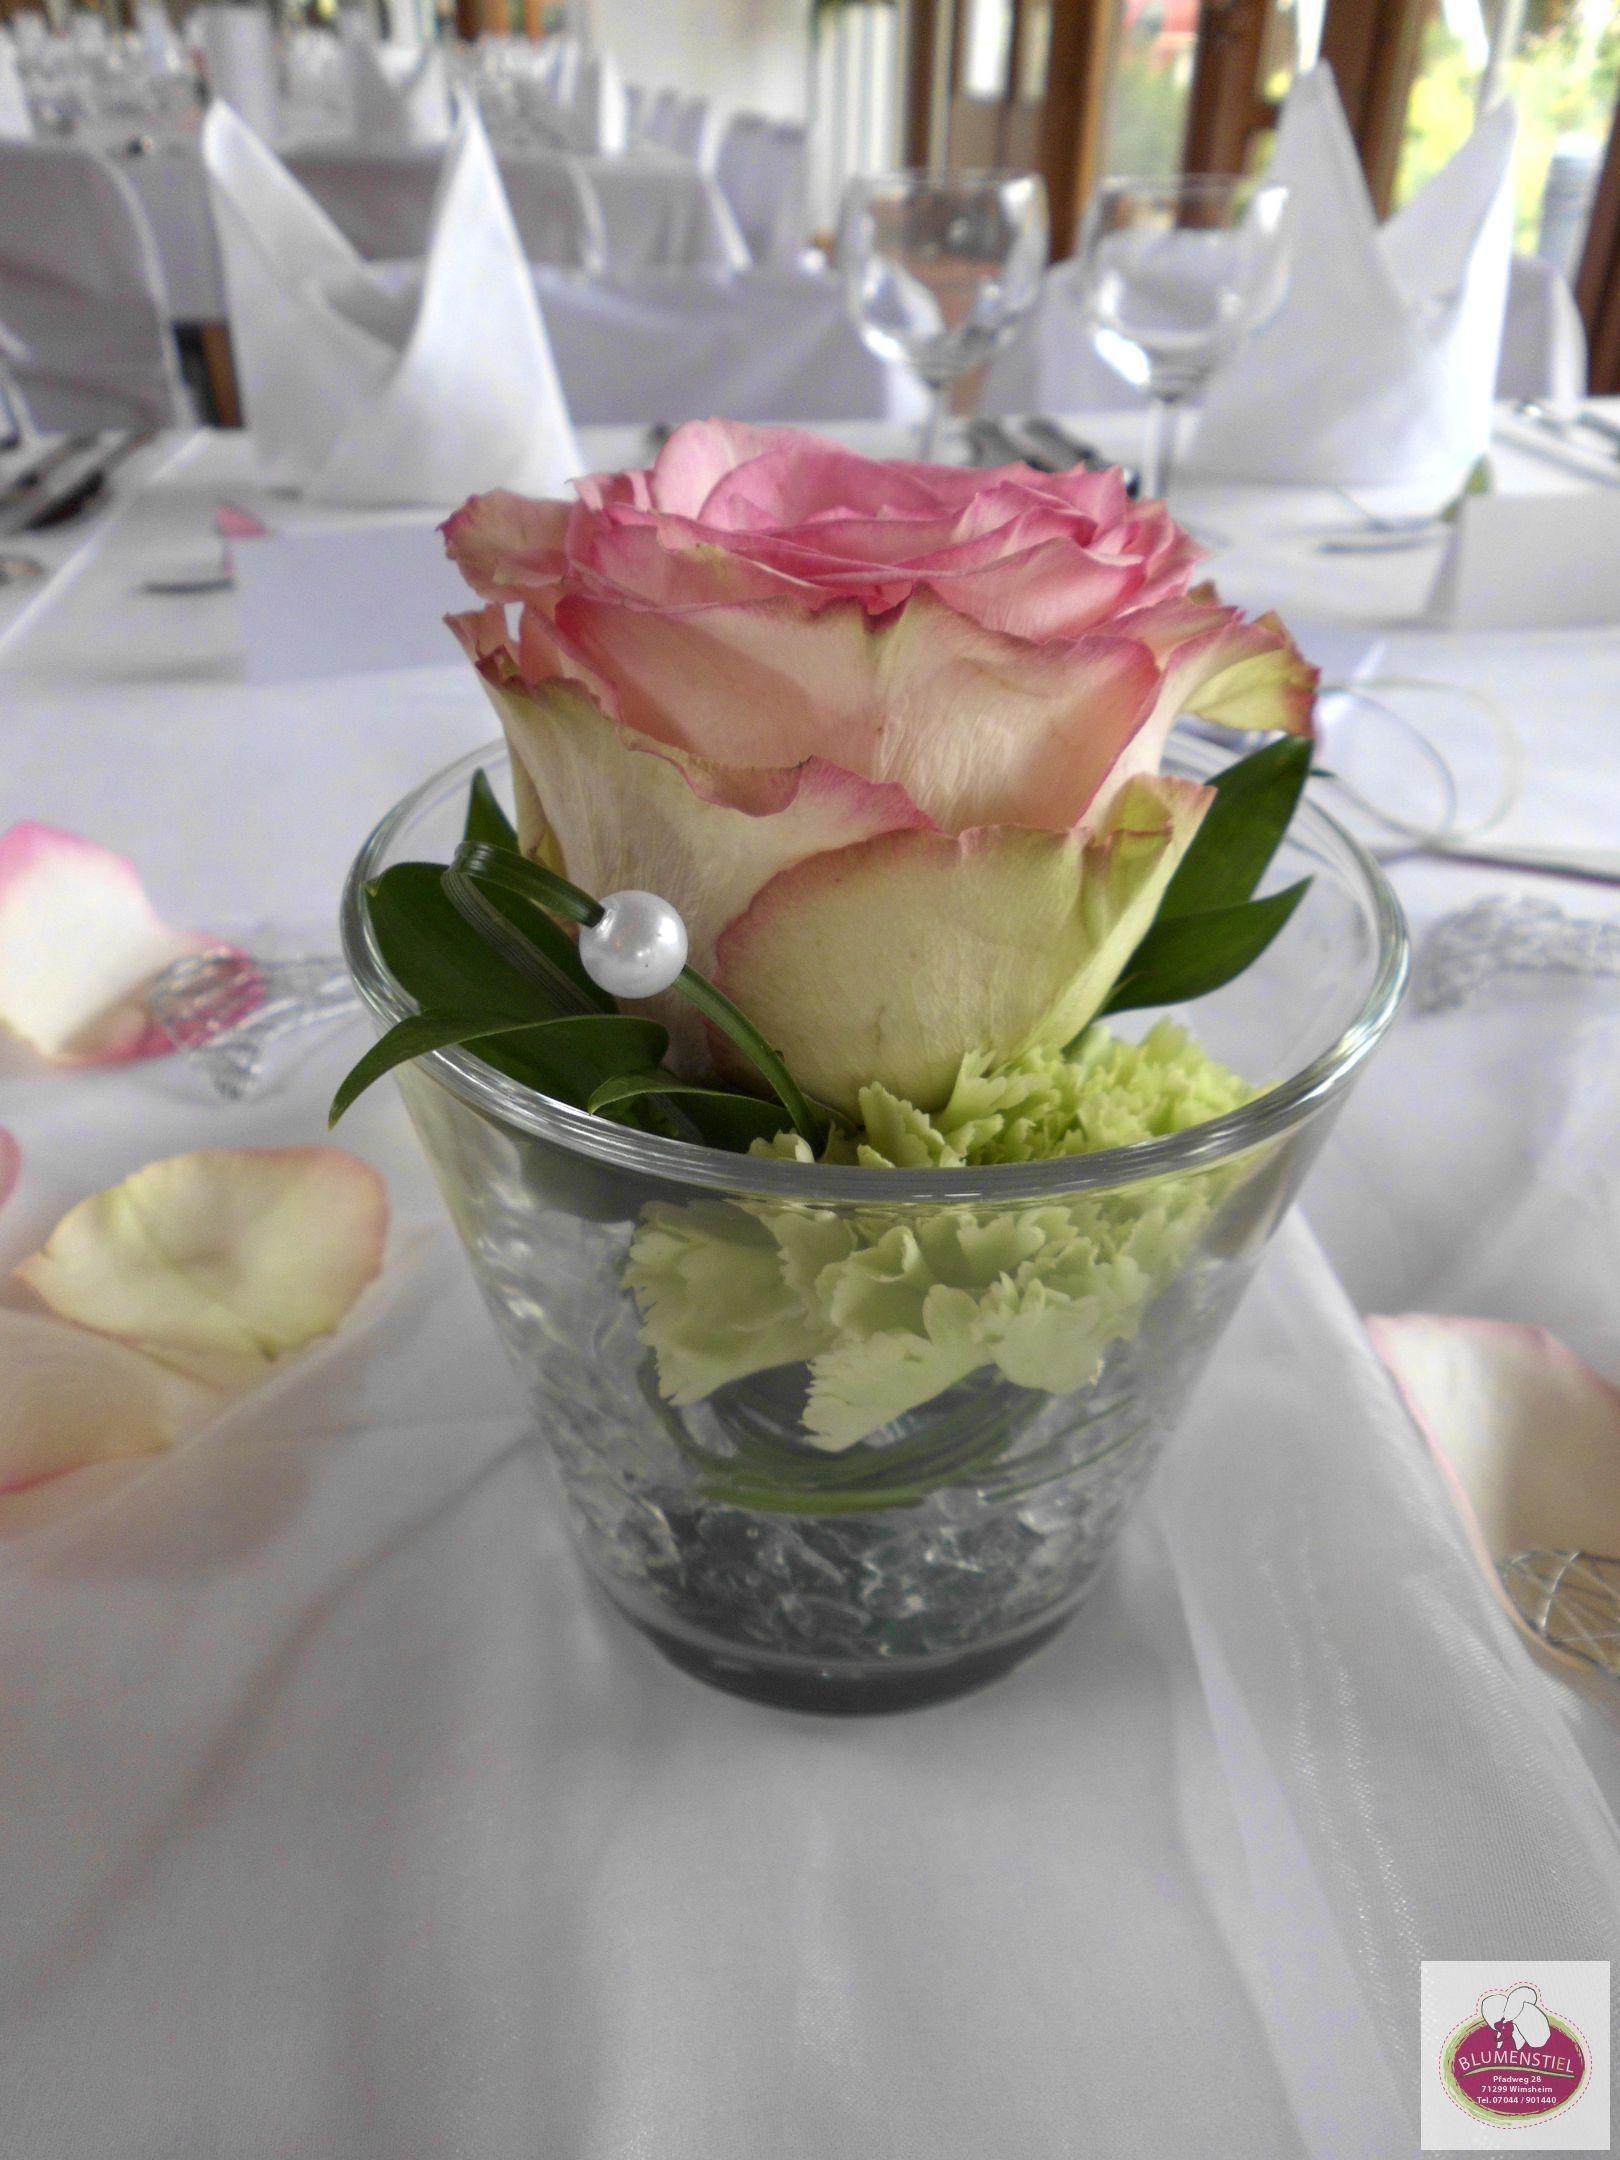 6 Einzigartig Blumenschmuck Tischdeko Geburtstag Deko